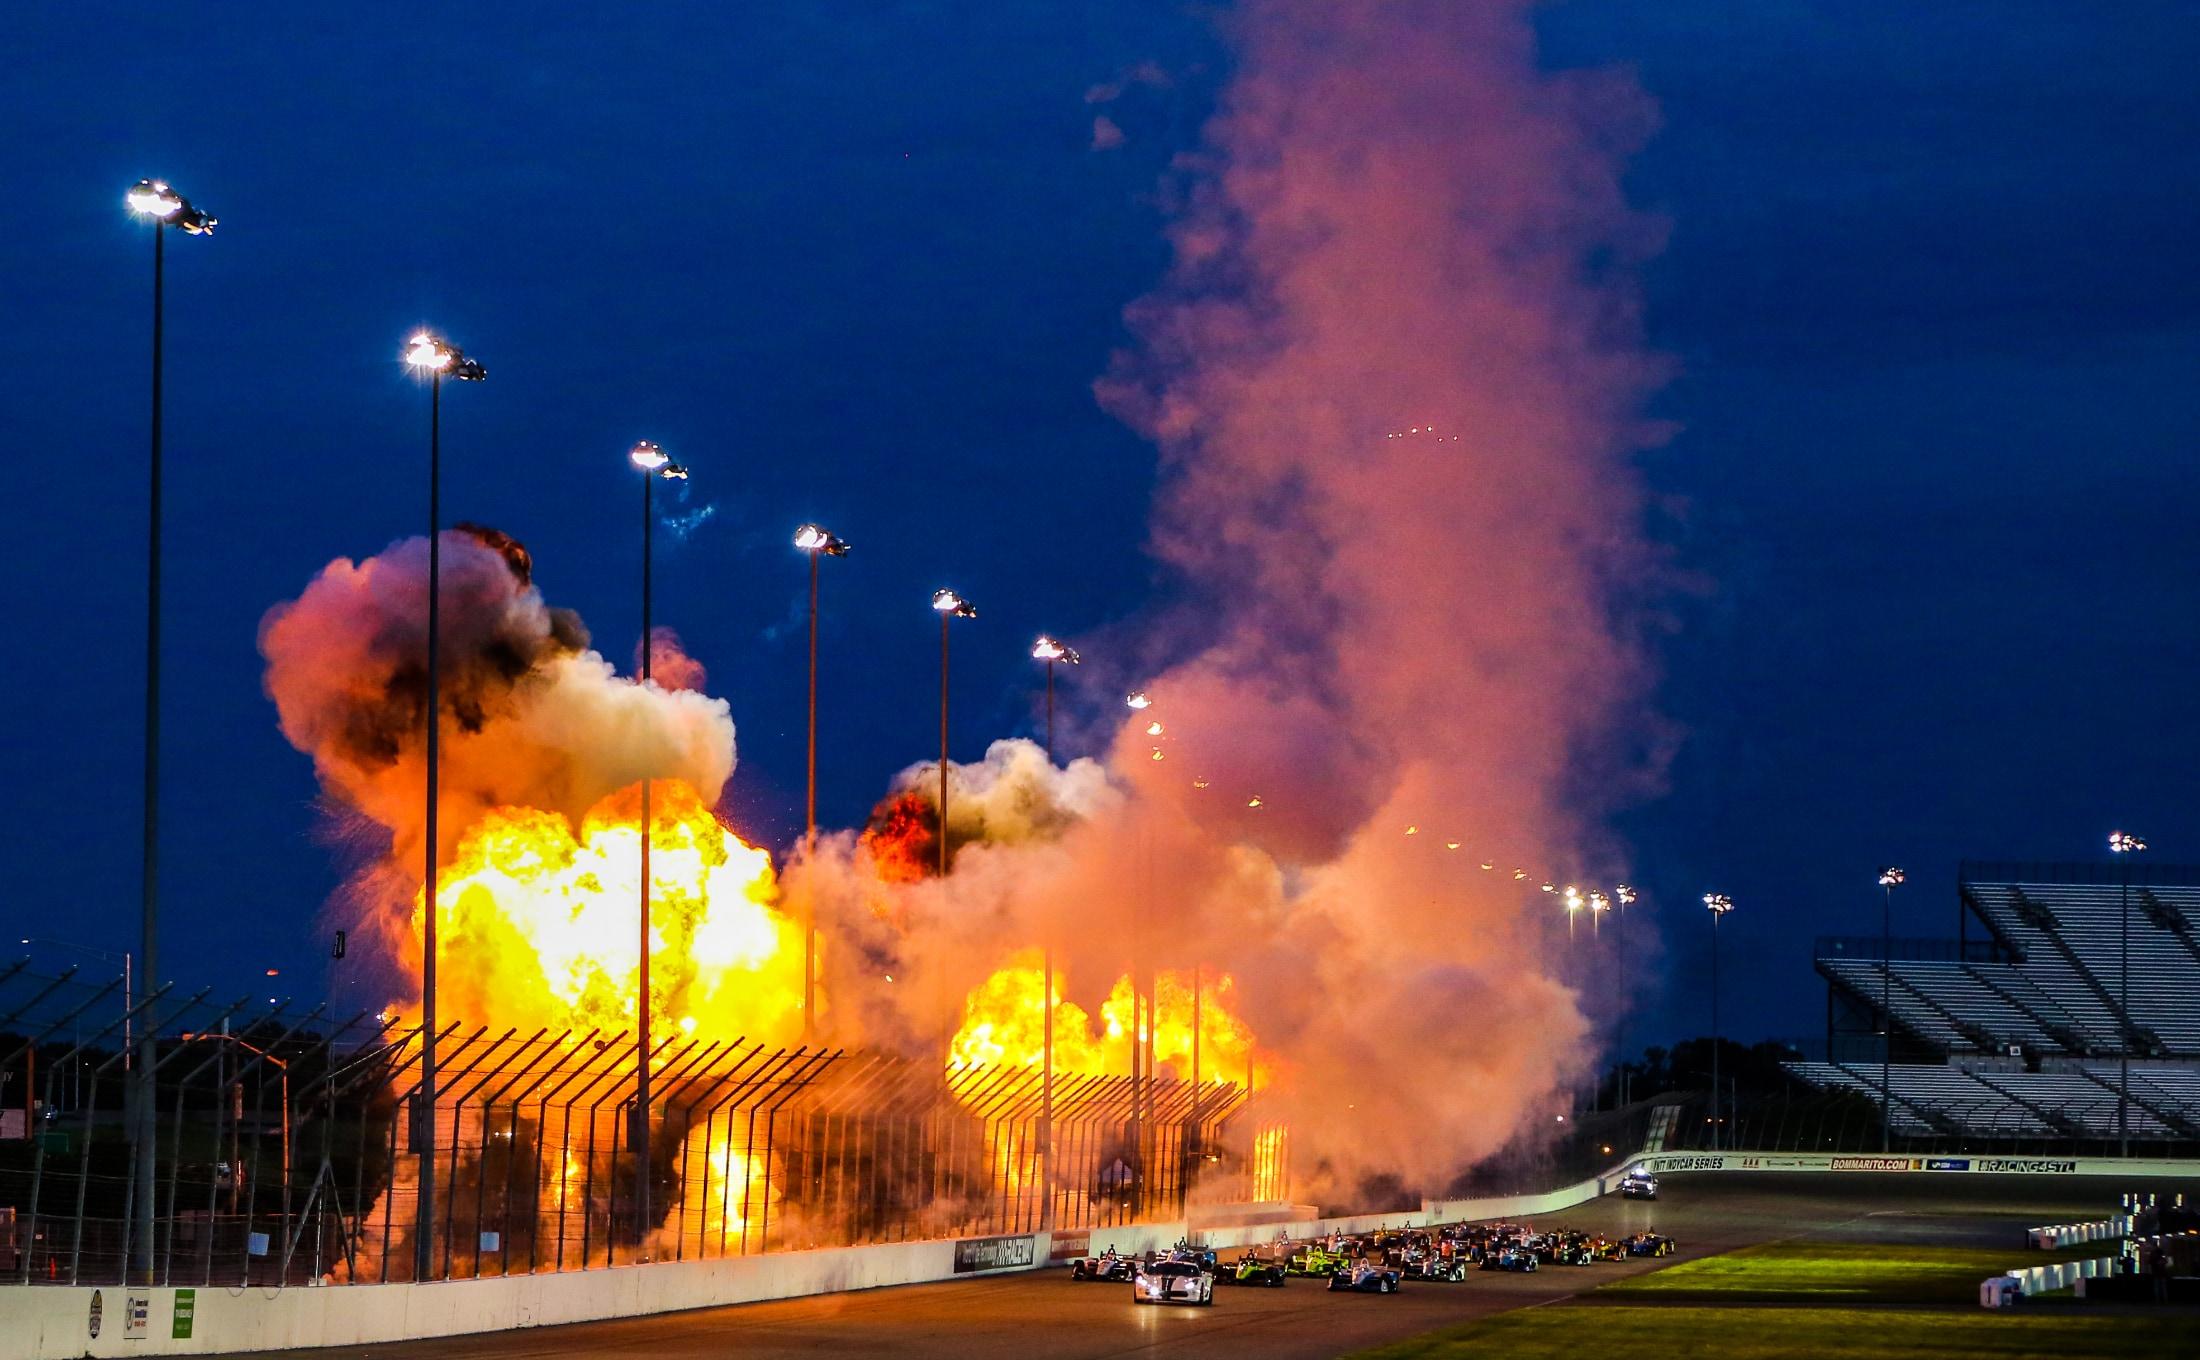 Fire display before 2019 Gateway IndyCar race start